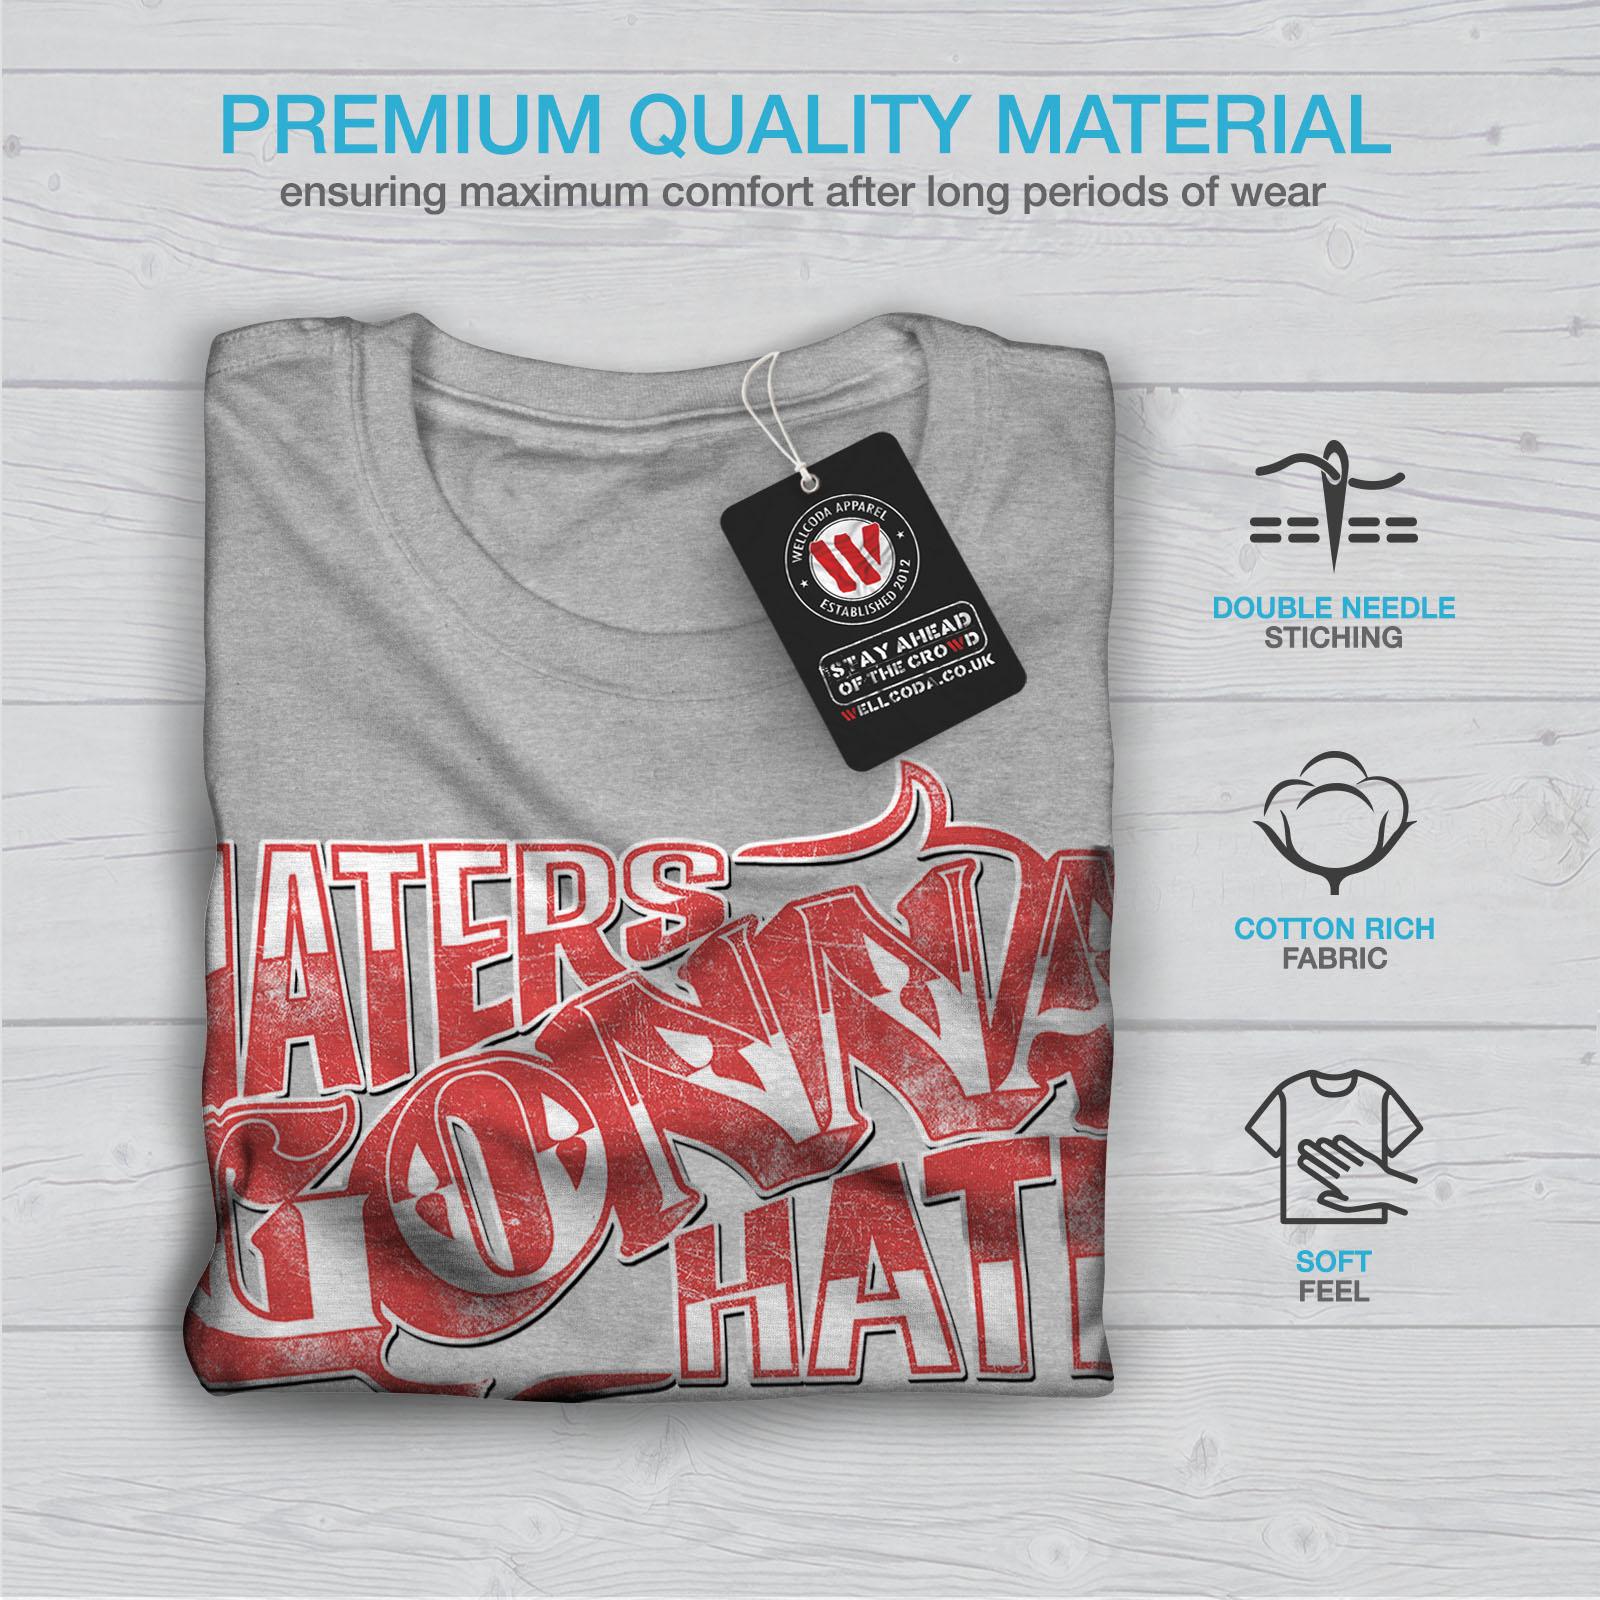 Wellcoda-Wasser-hassen-Zitat-Slogan-Herren-T-Shirt-True-Grafikdesign-Printed-Tee Indexbild 19